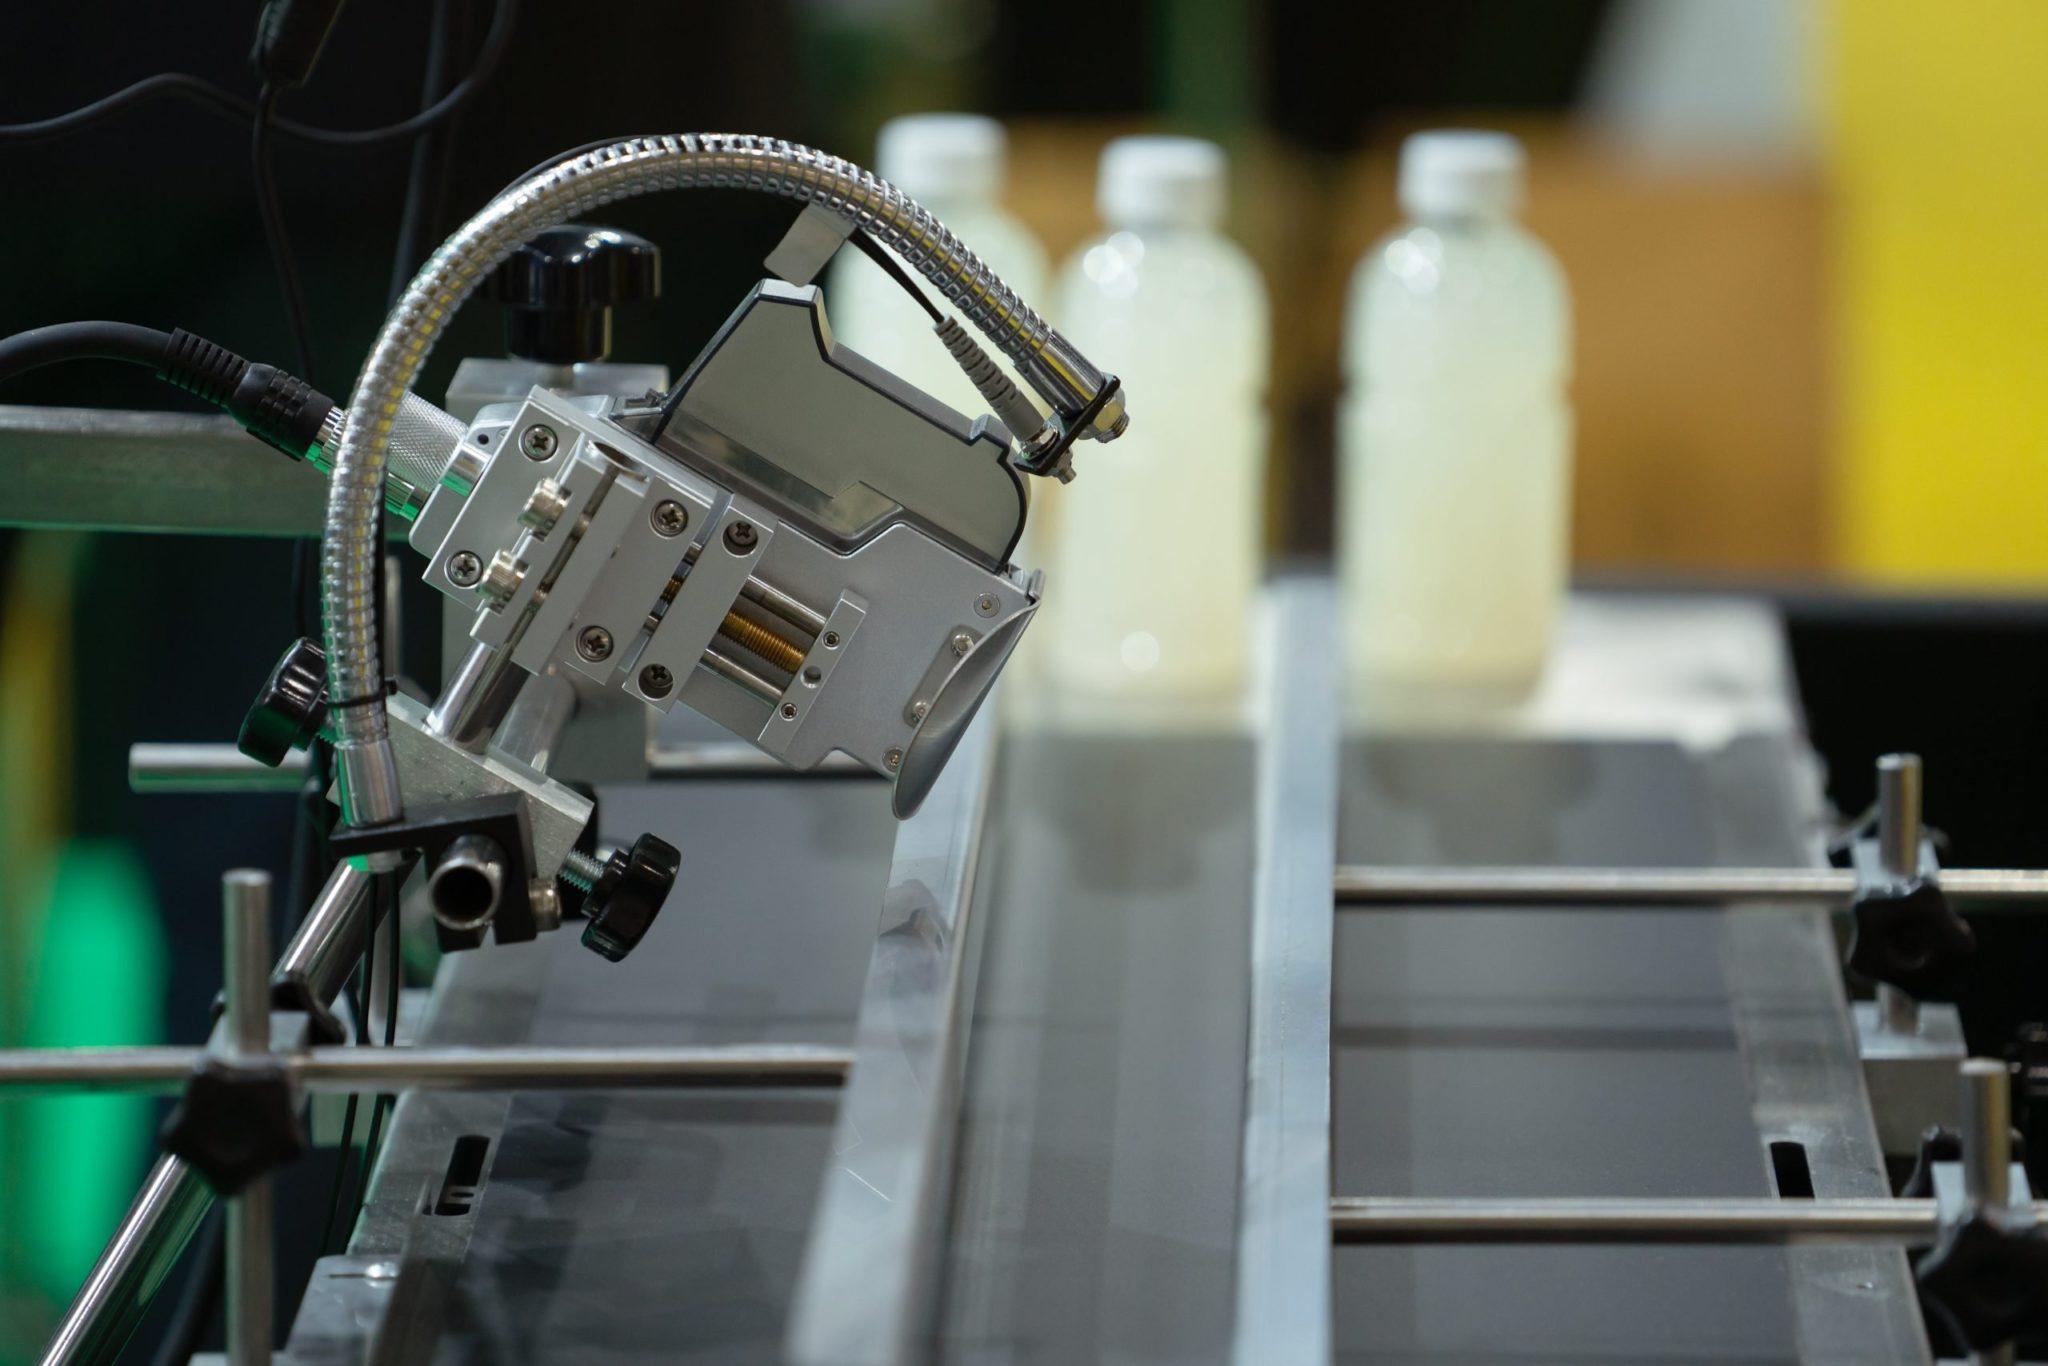 photosensor and proximity sensor in automation line